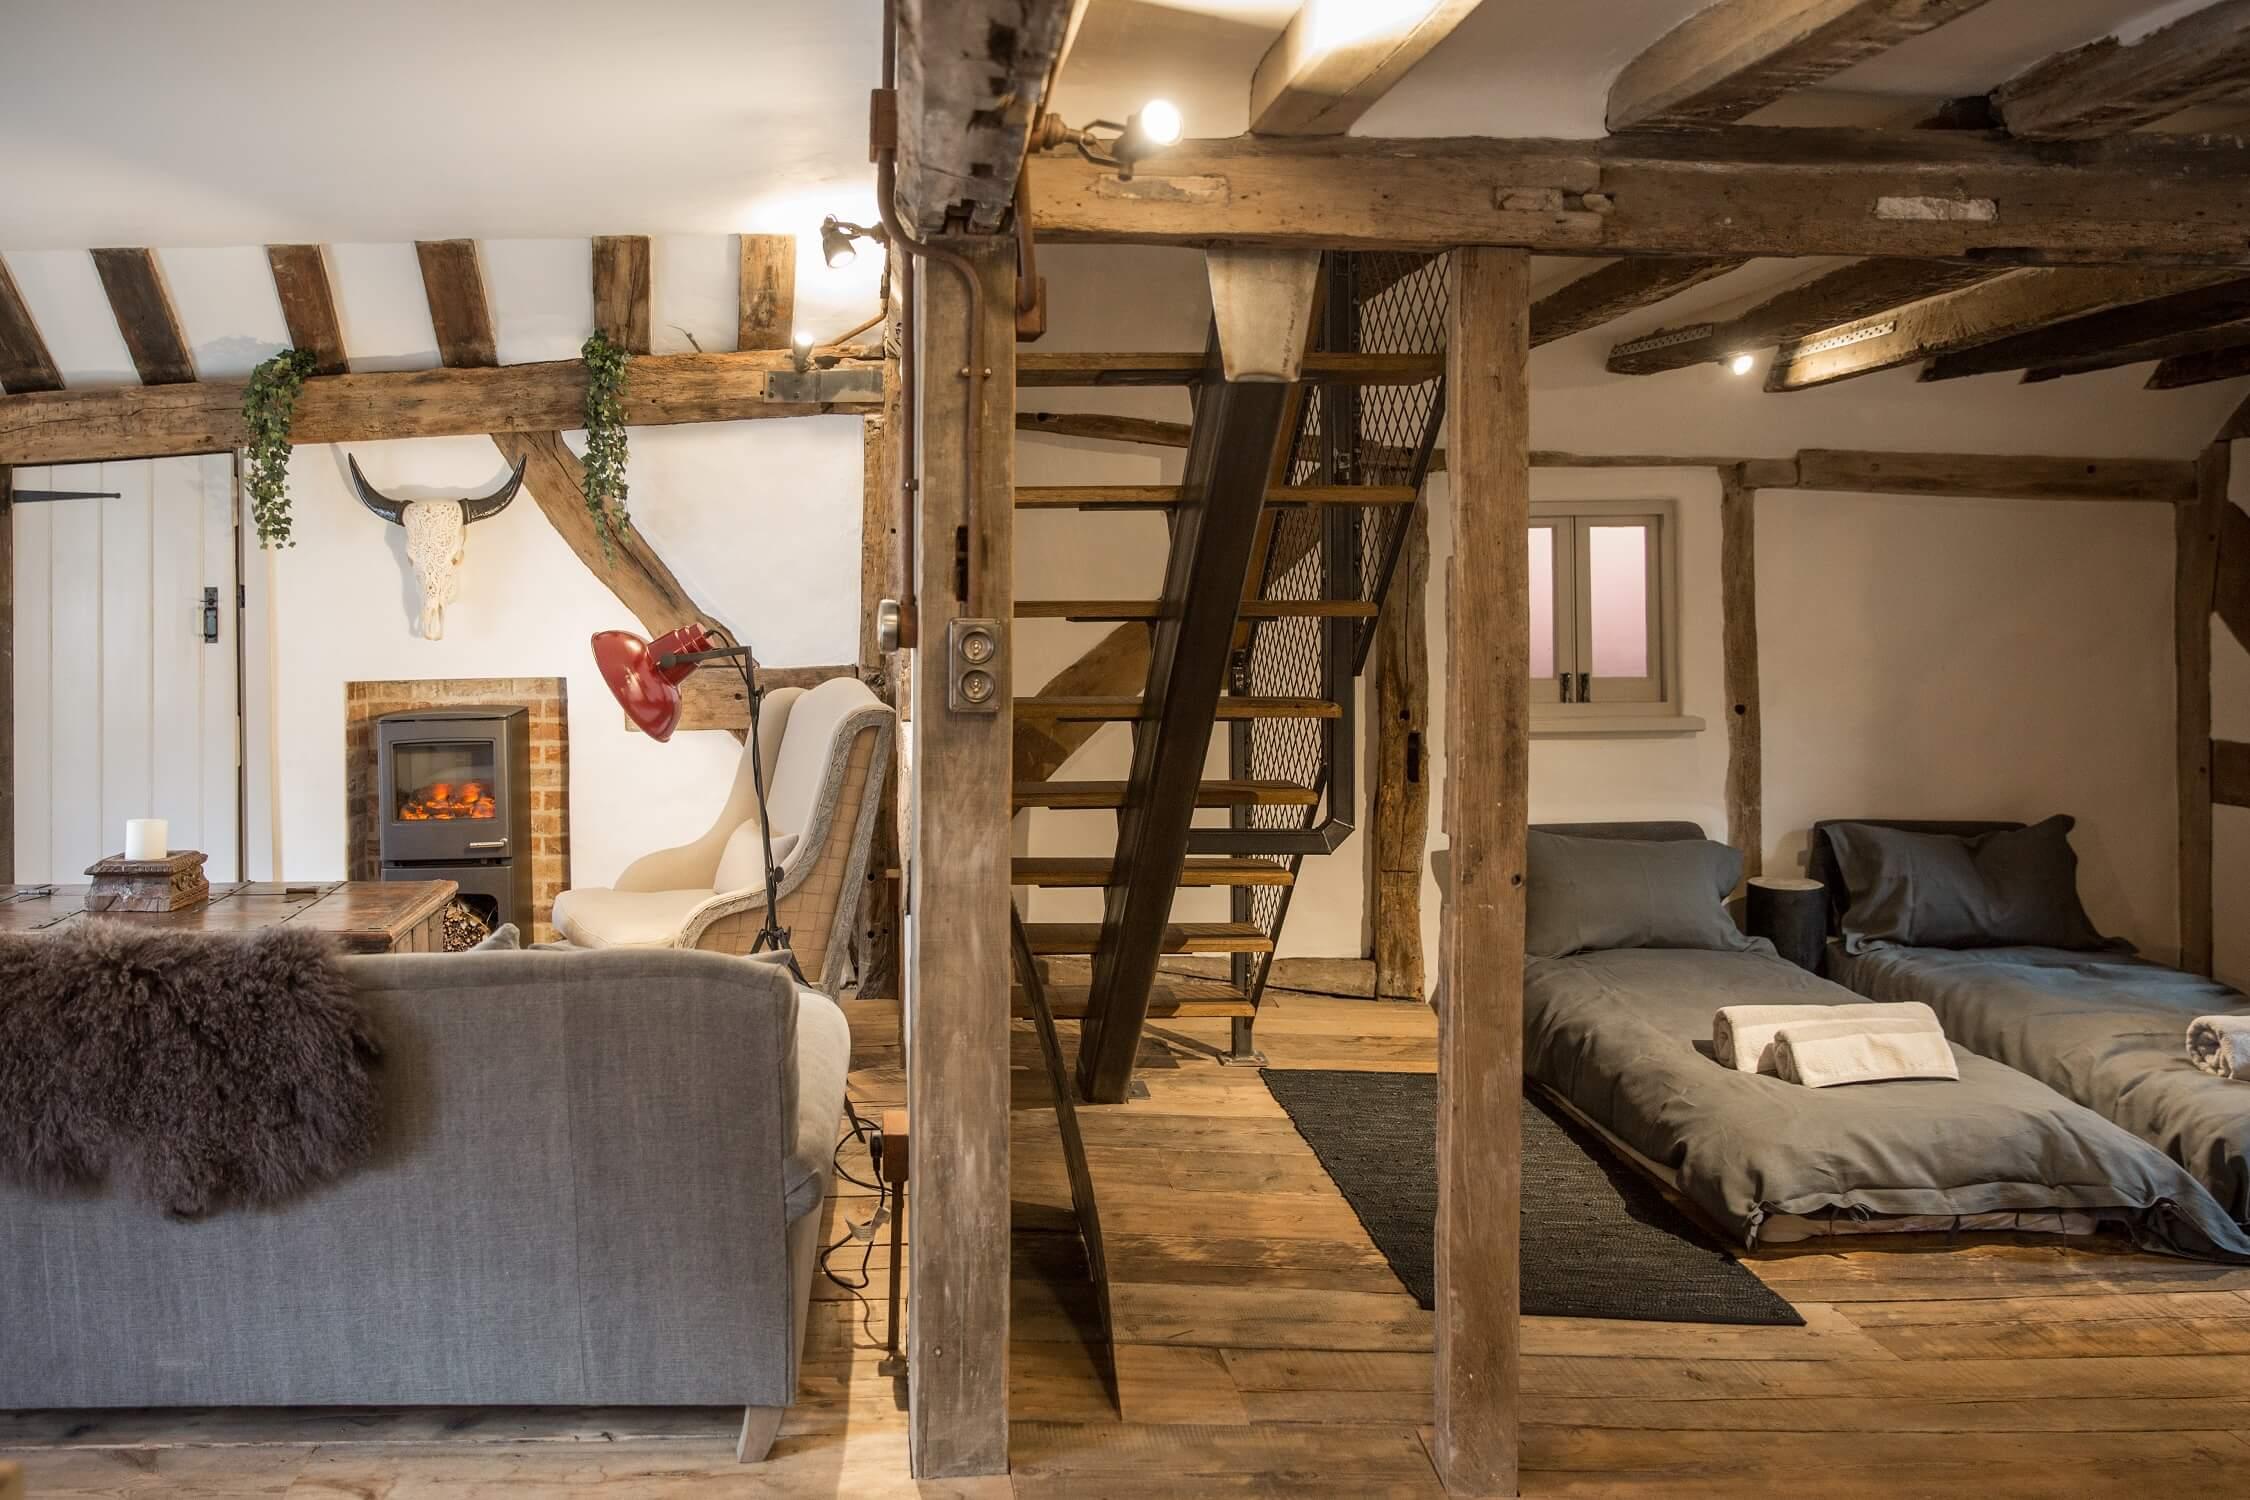 West Street Loft extra beds